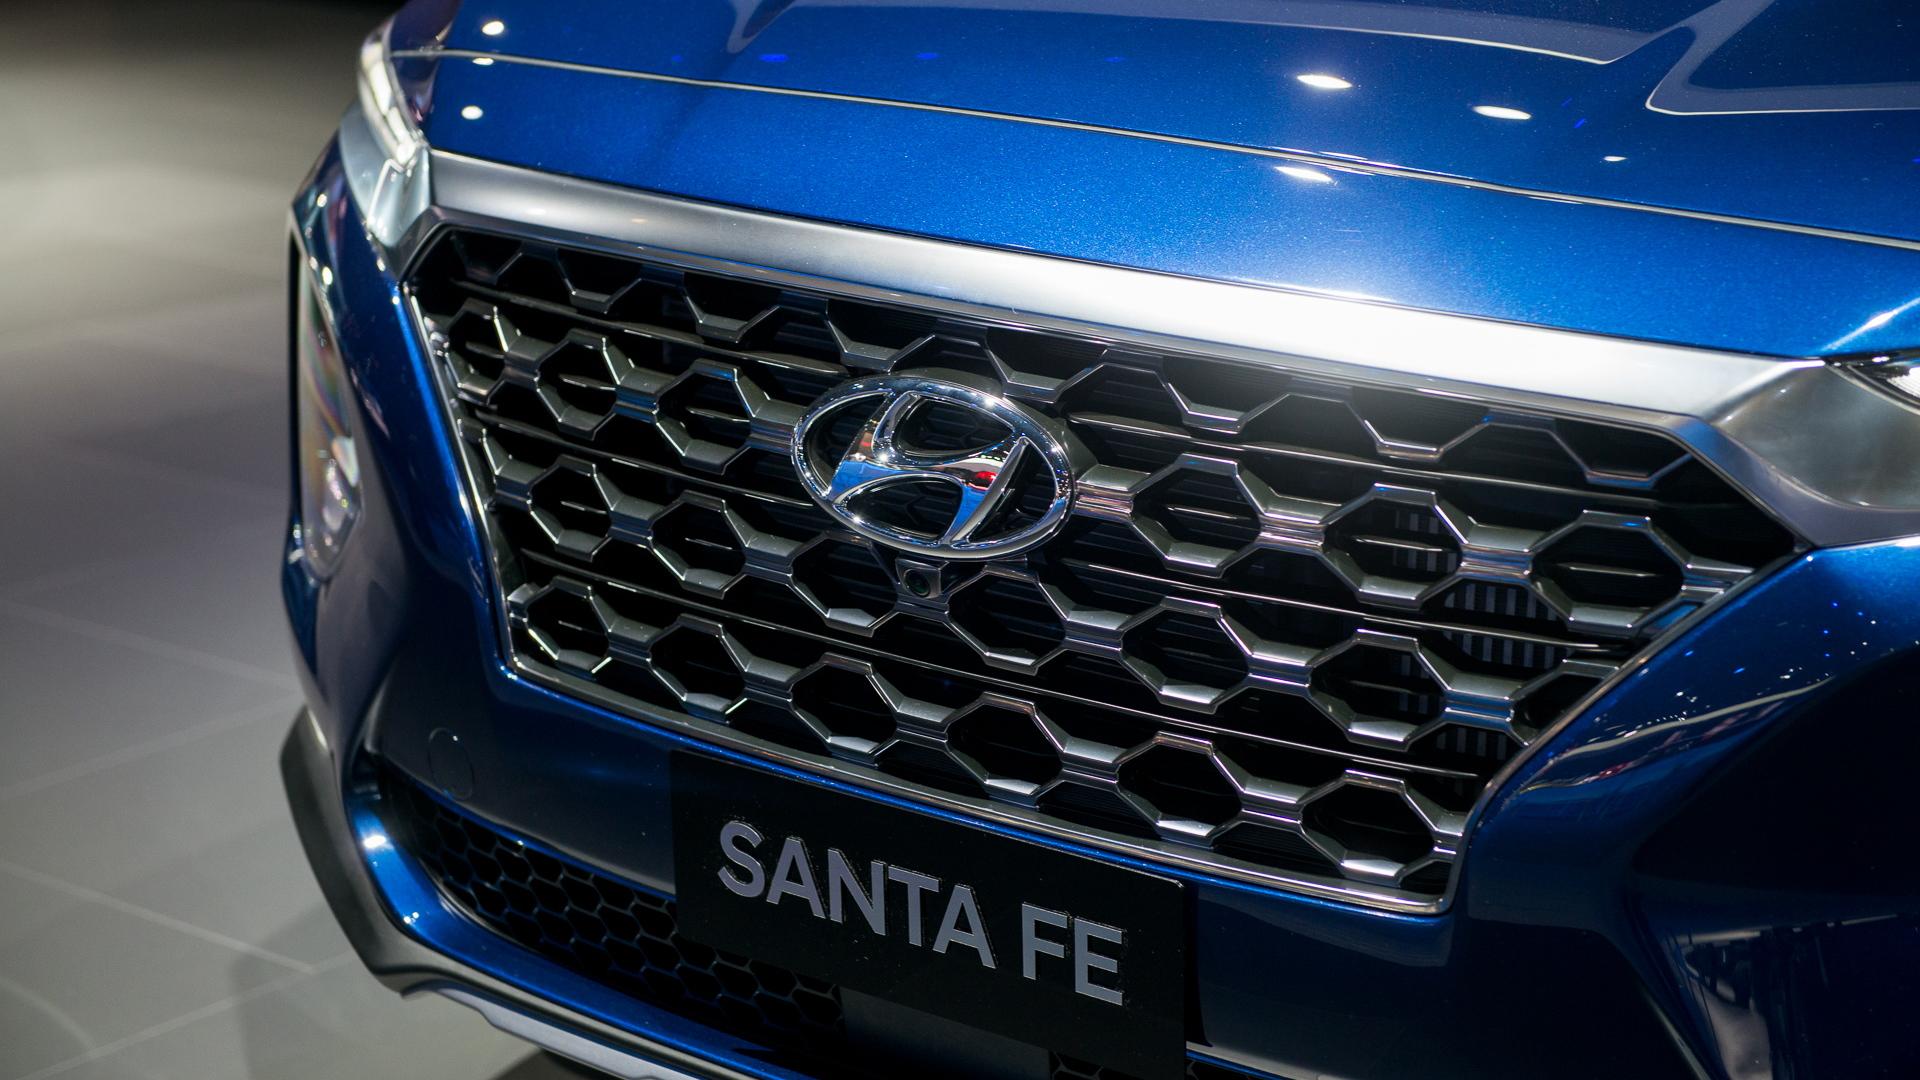 2019 Hyundai Santa Fe, 2018 New York auto show